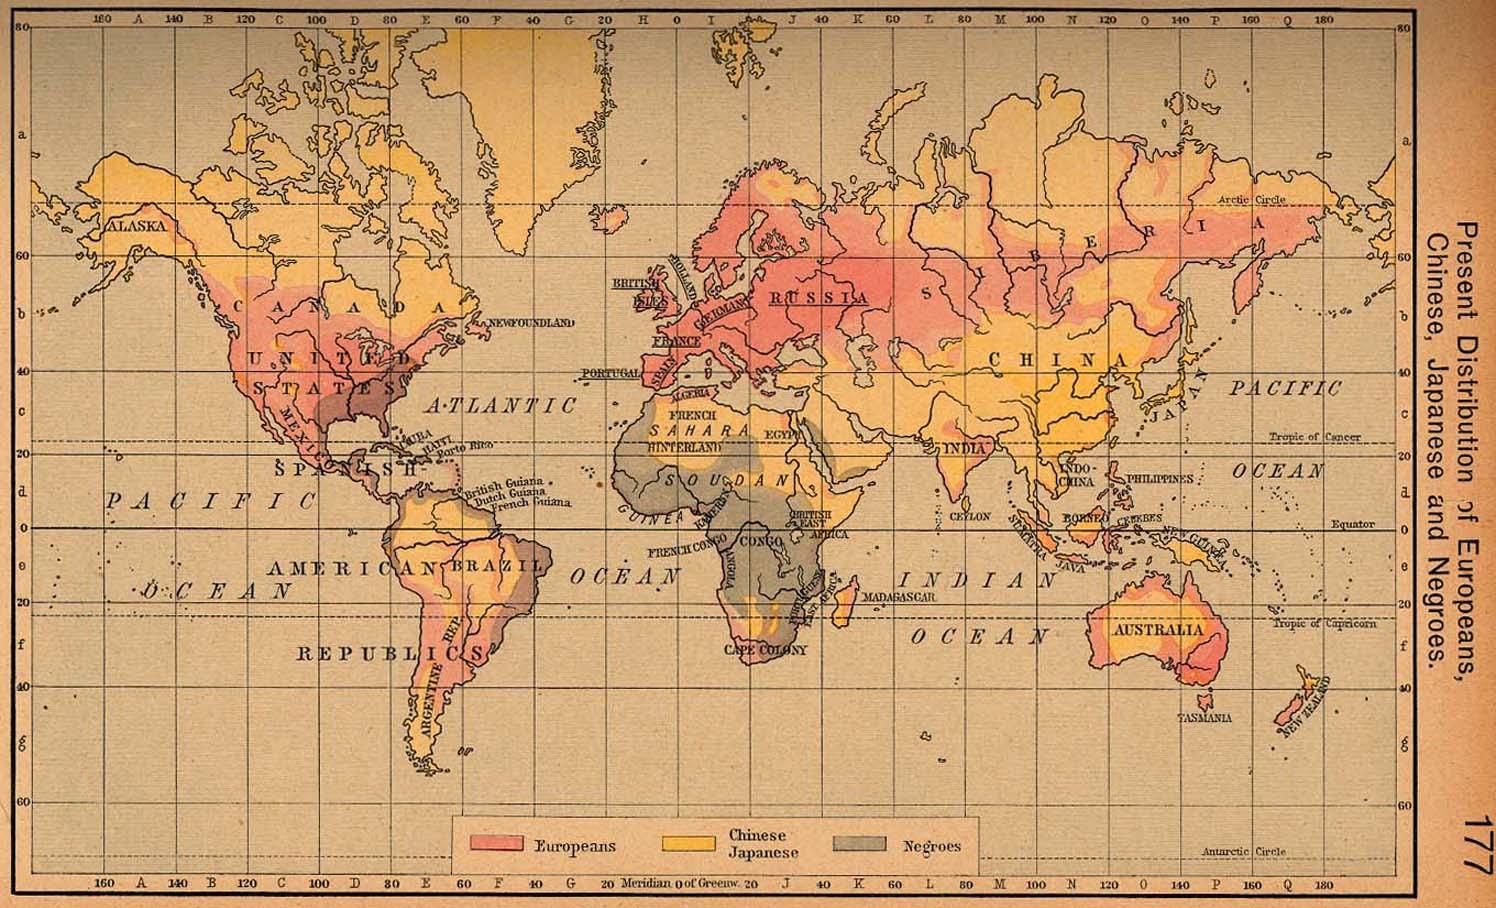 Indiana jones comunidad fan ver tema mapa estilo indy httplibutexasmapshistoricalshepherdethnicdistributiong gumiabroncs Choice Image